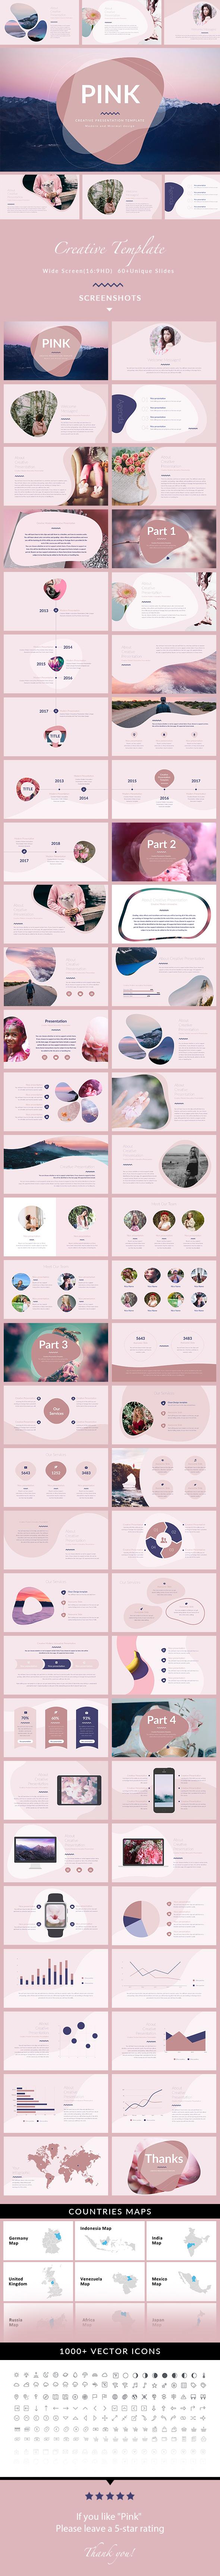 Pink - Minimal & Creative PowerPoint Template - Creative PowerPoint Templates